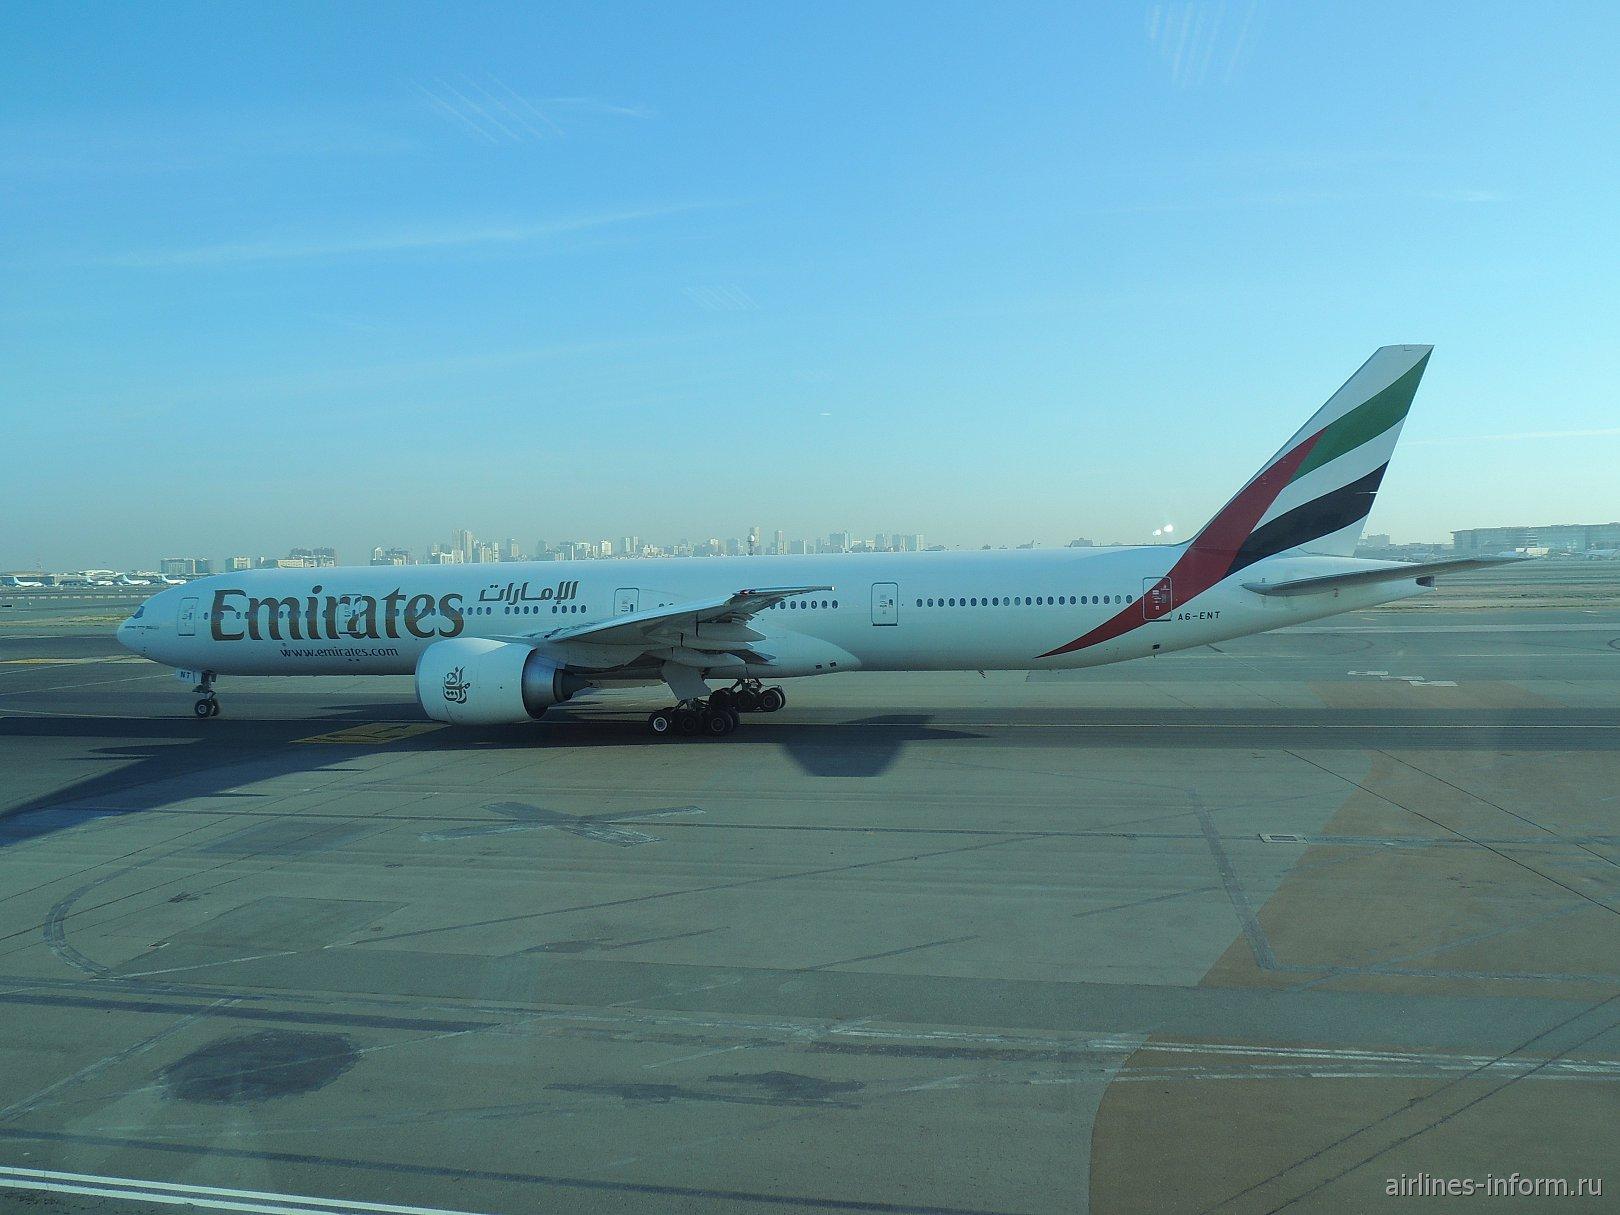 Боинг-777-300 авиакомпании Emirates в аэропорту Дубай